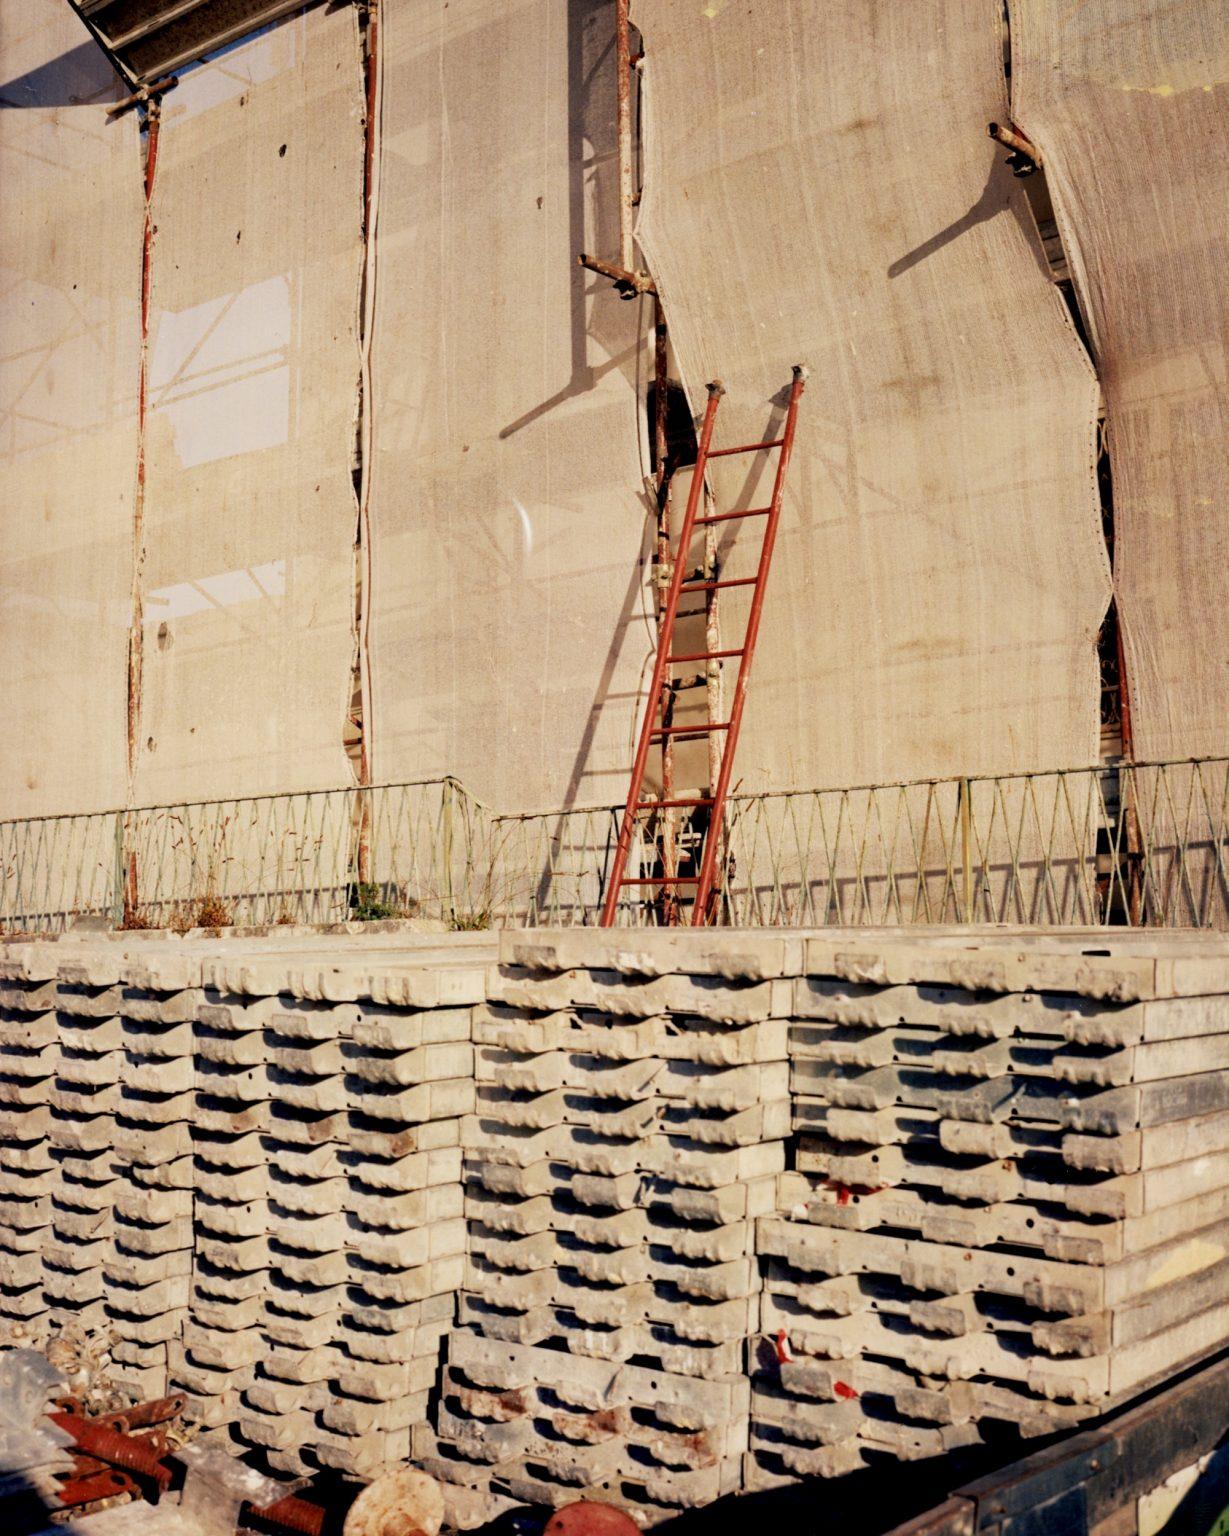 Ladder and scaffolding in construction zone. Paesi Vesuviani, Province of Naples. 2020